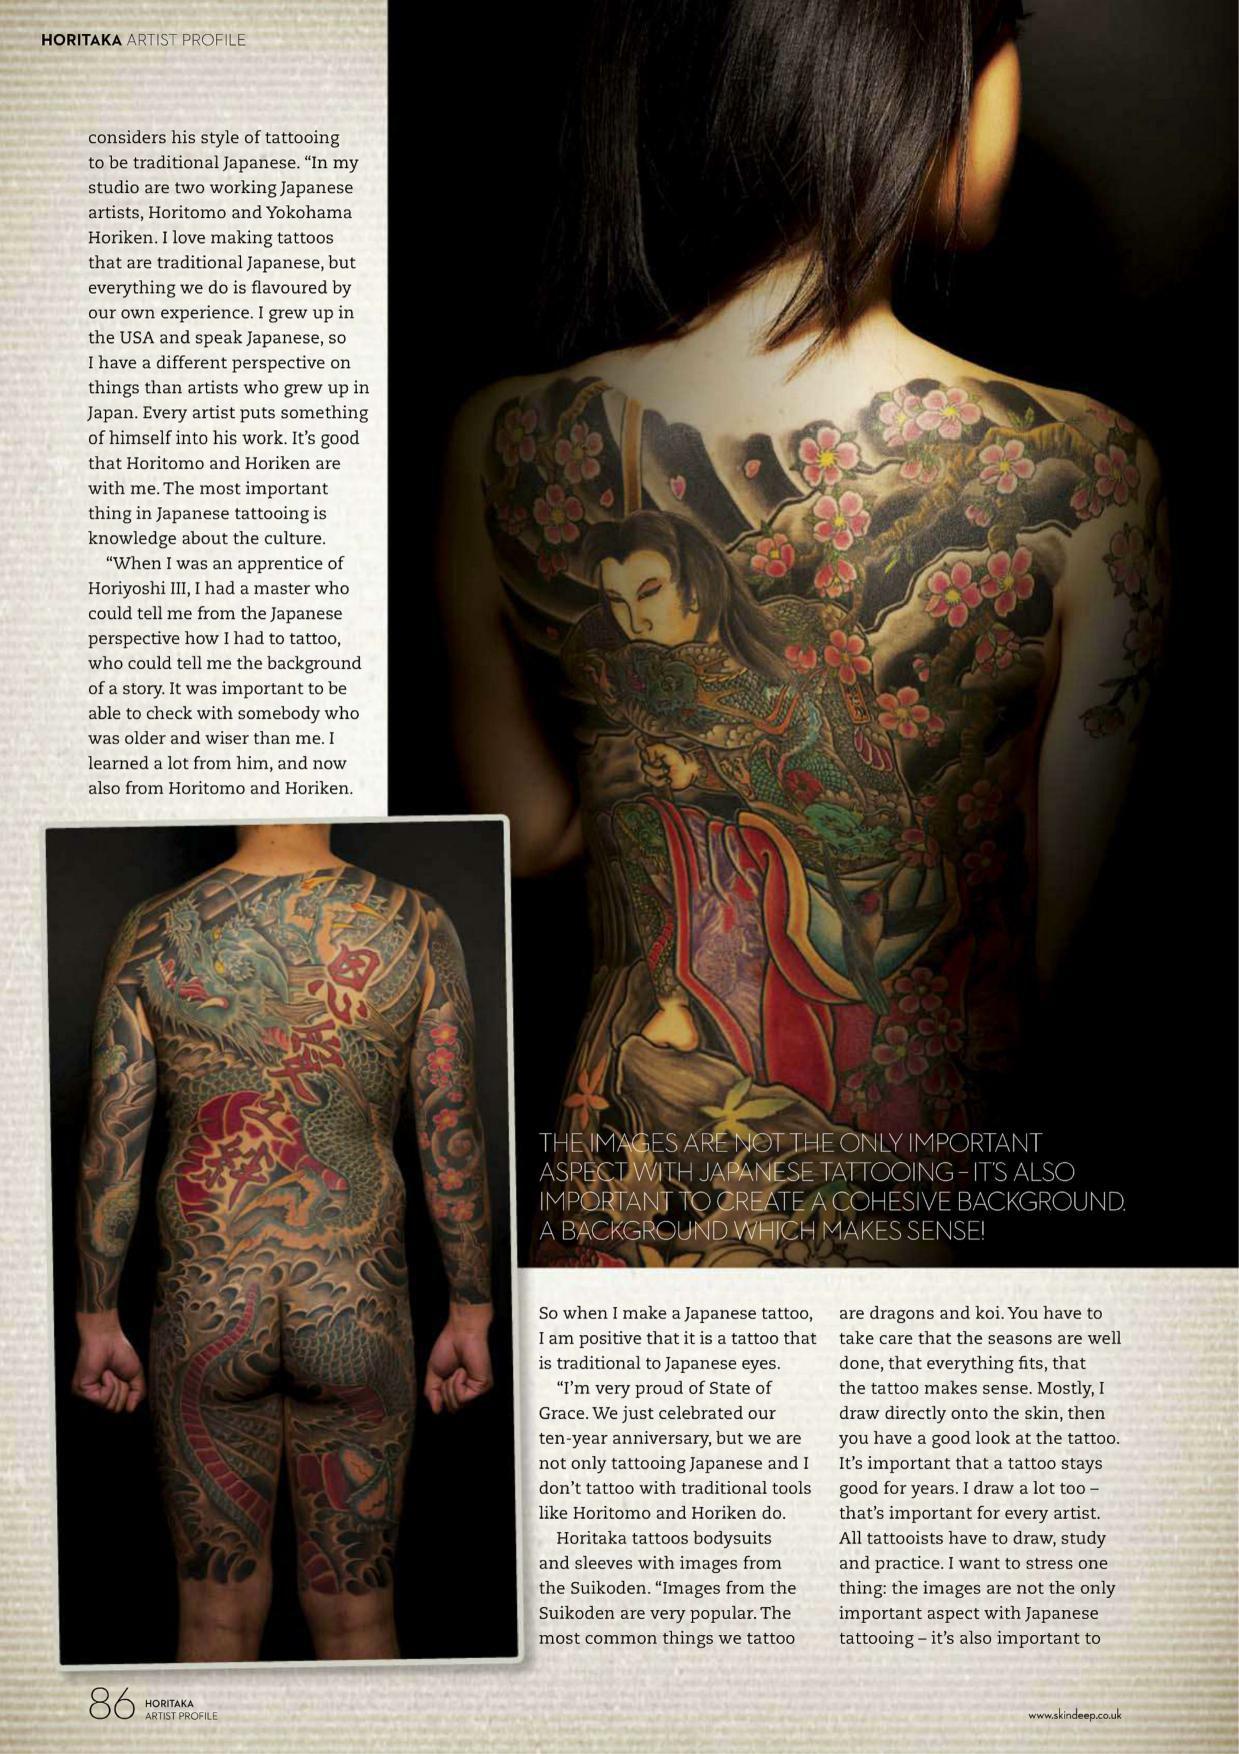 Онлайн-журнал о тату Фото. Стили. Каталог татуировок 97